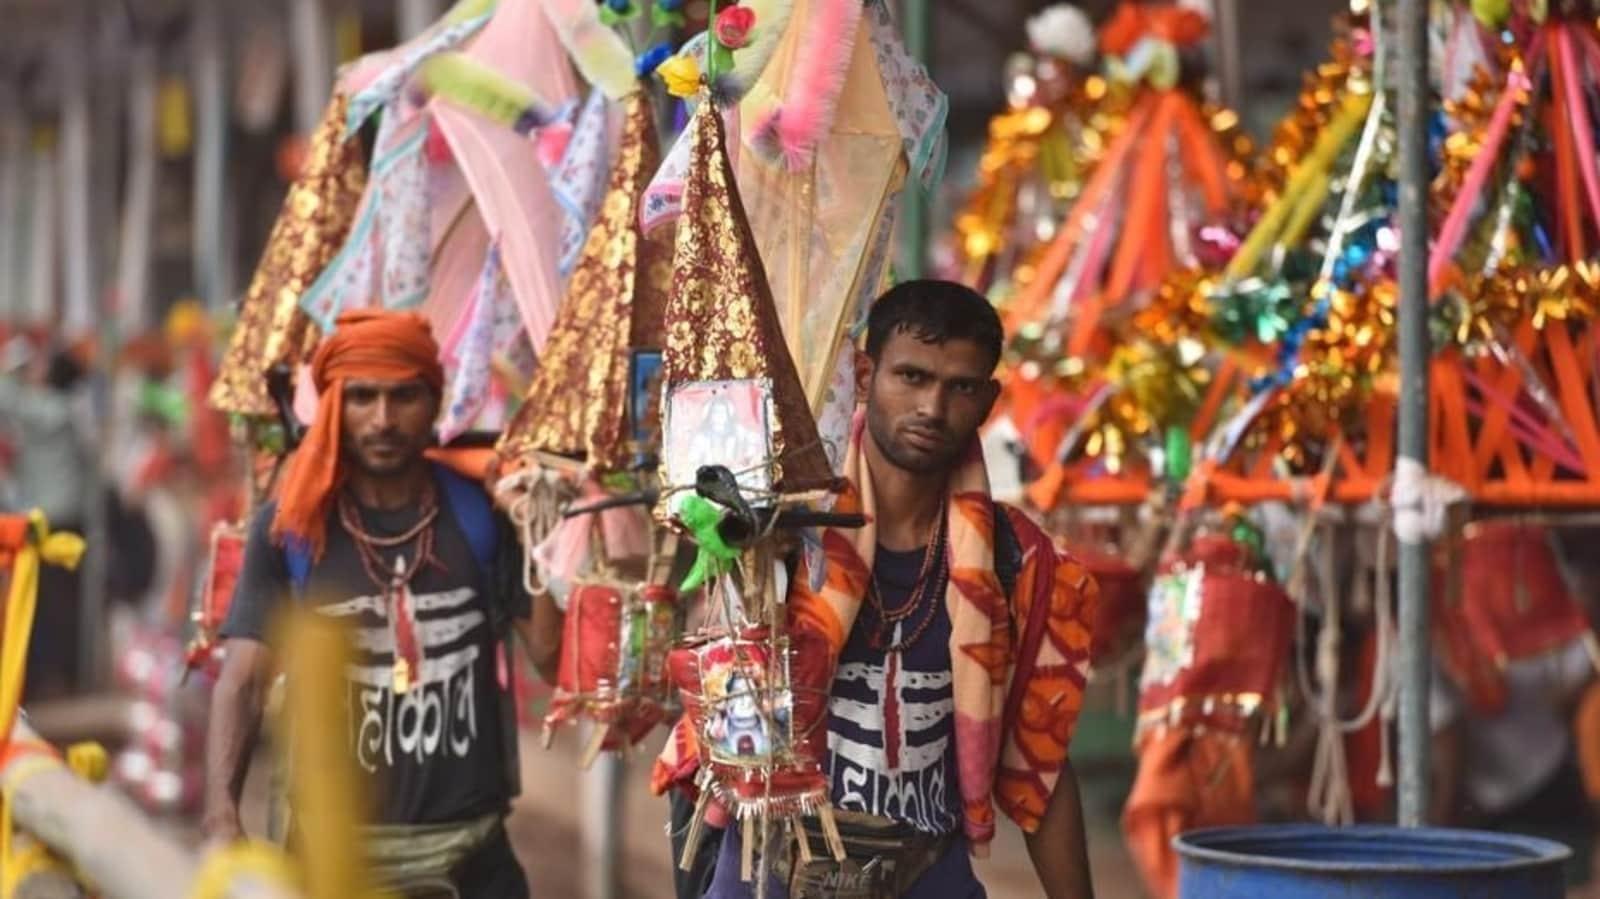 Uttar Pradesh govt insists Kanwar yatra will go on | Latest News India -  Hindustan Times